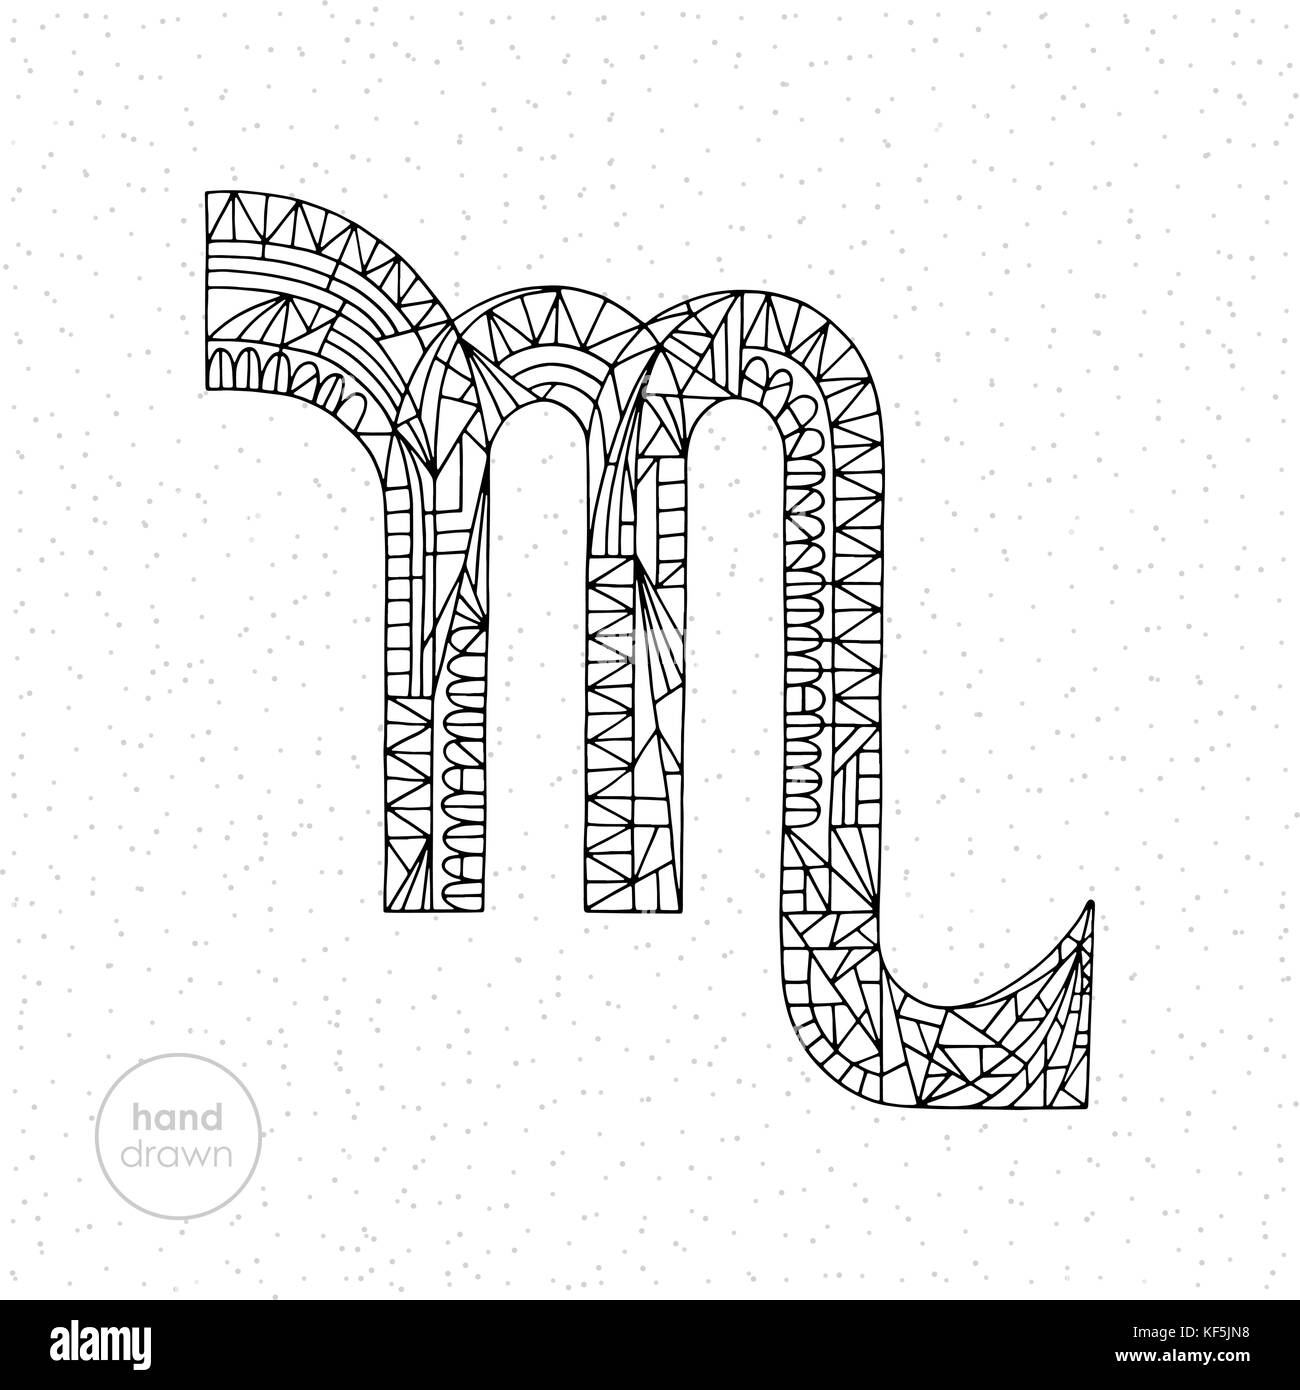 Scorpio zodiac sign vector hand drawn horoscope illustration stock scorpio zodiac sign vector hand drawn horoscope illustration astrological coloring page buycottarizona Image collections